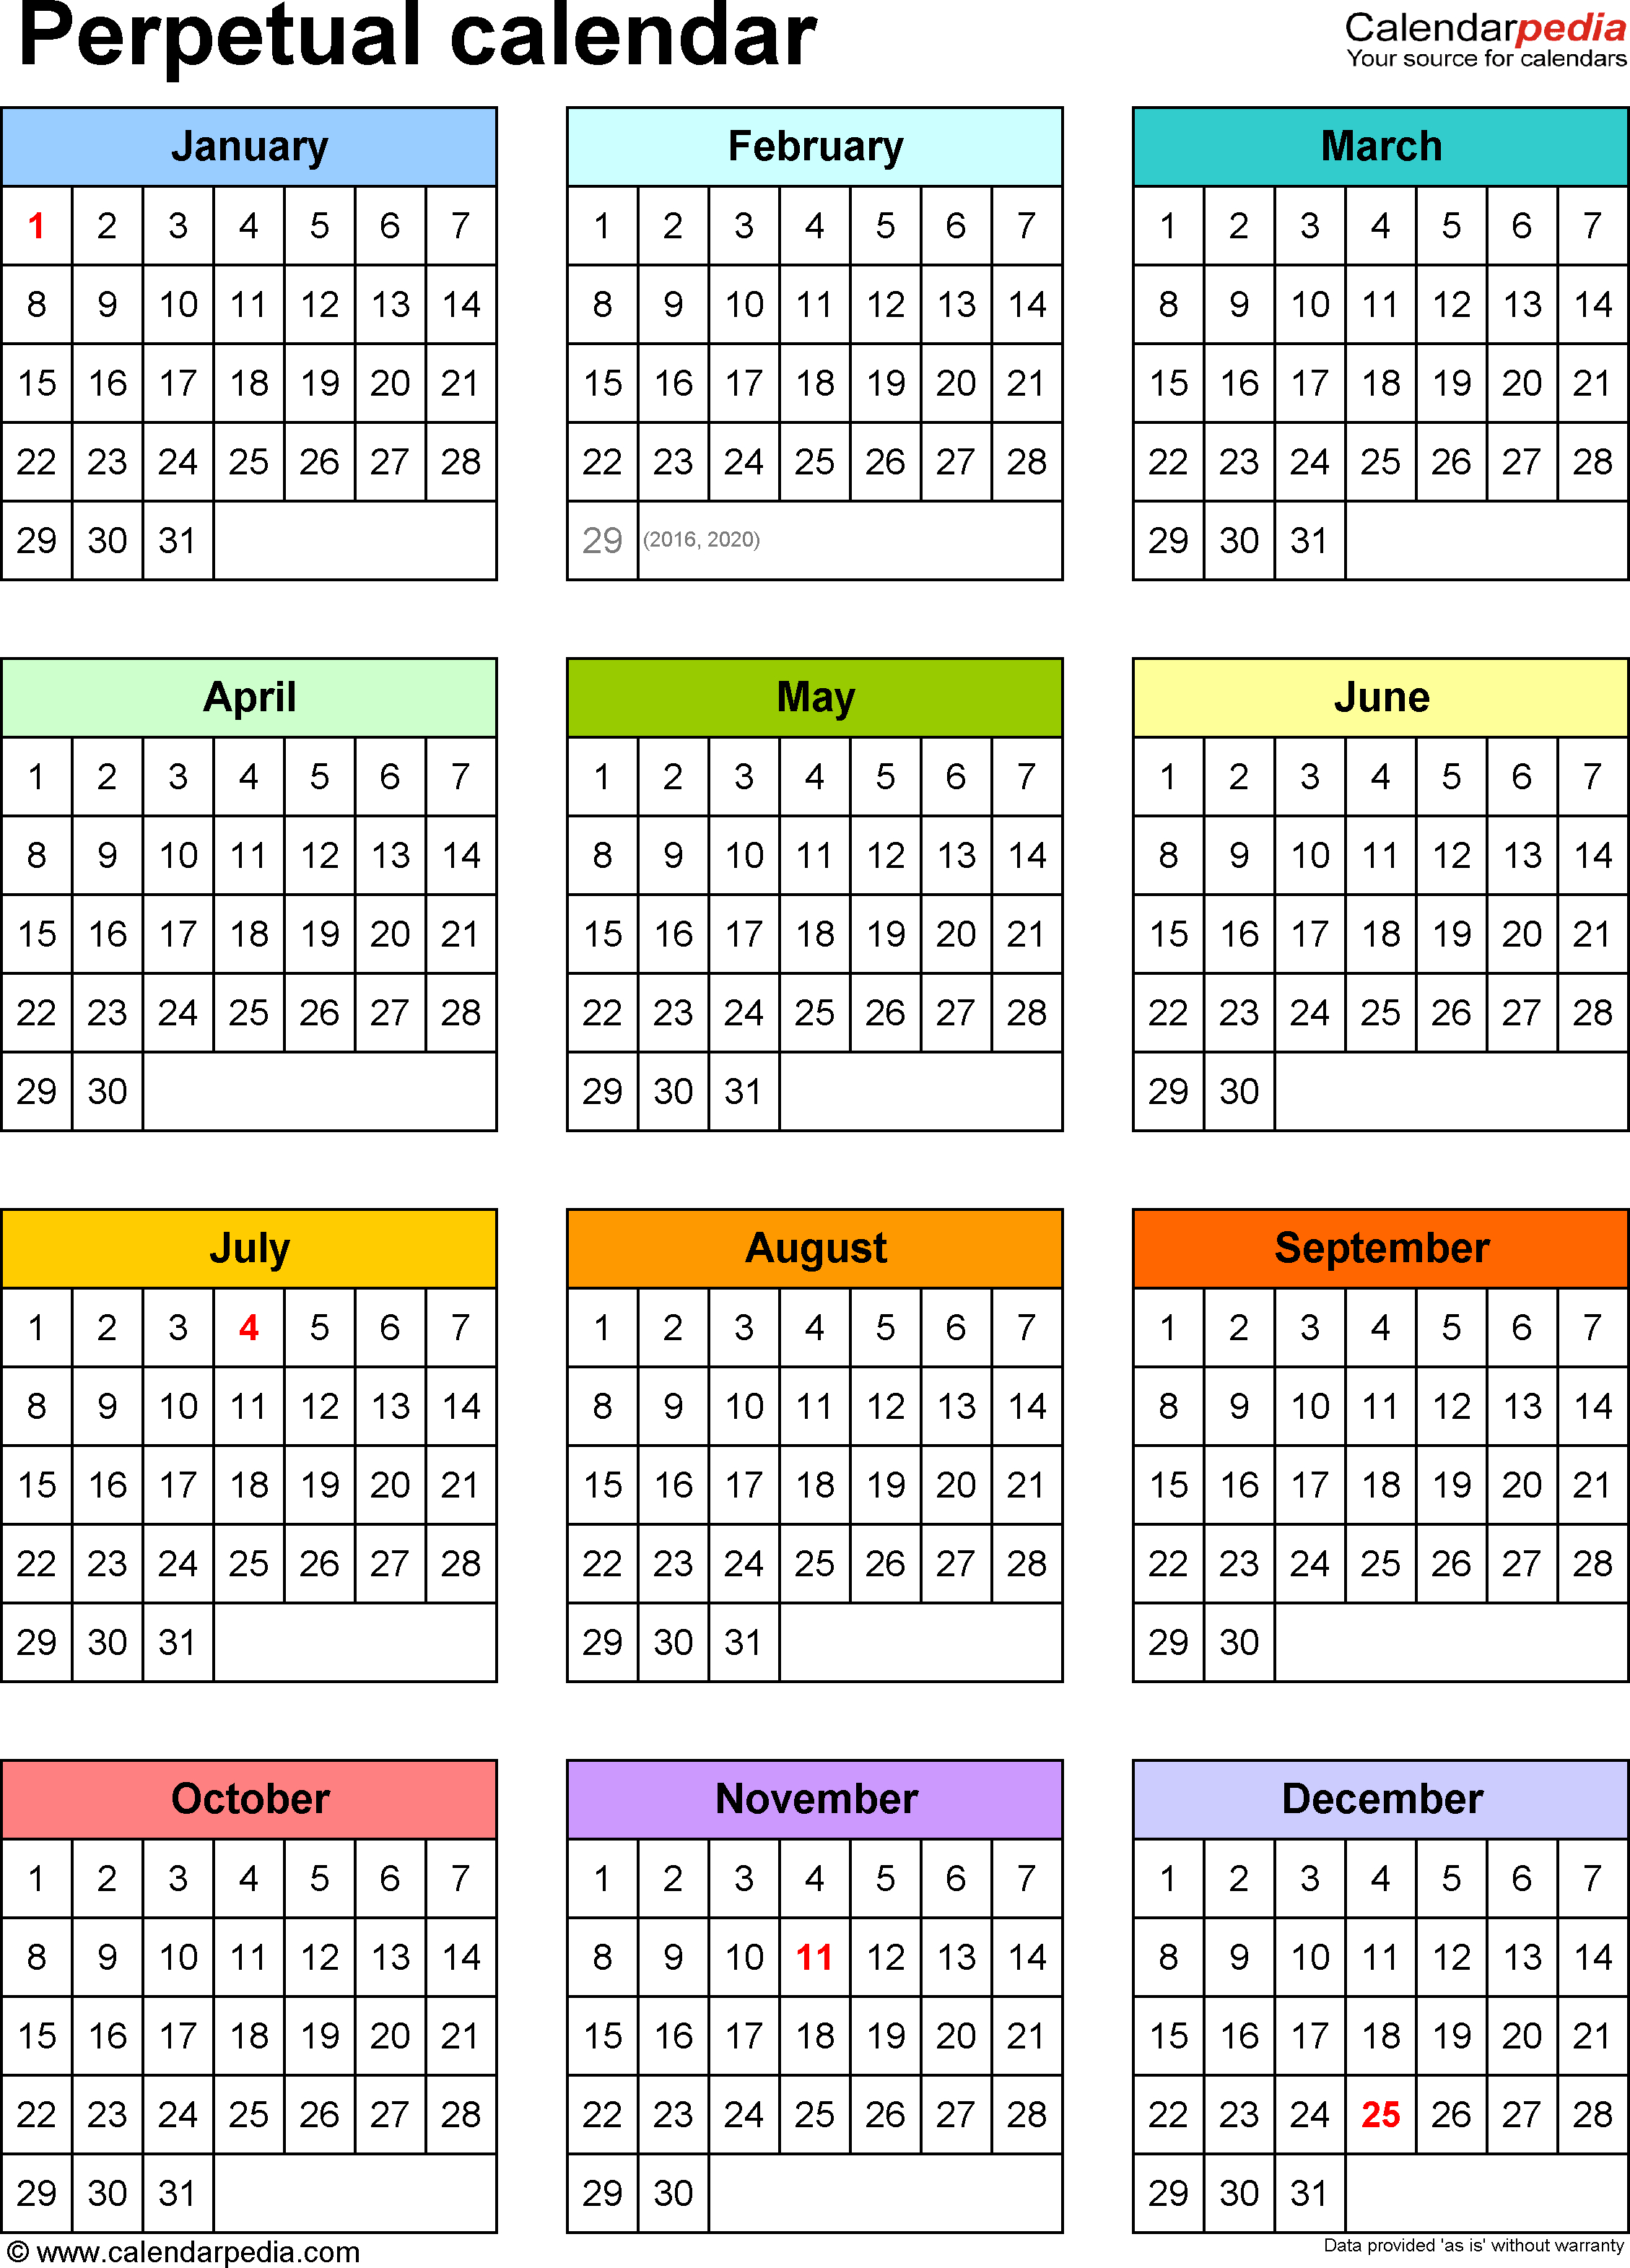 Template 9: Pdf Template For Perpetual Calendar (Portrait